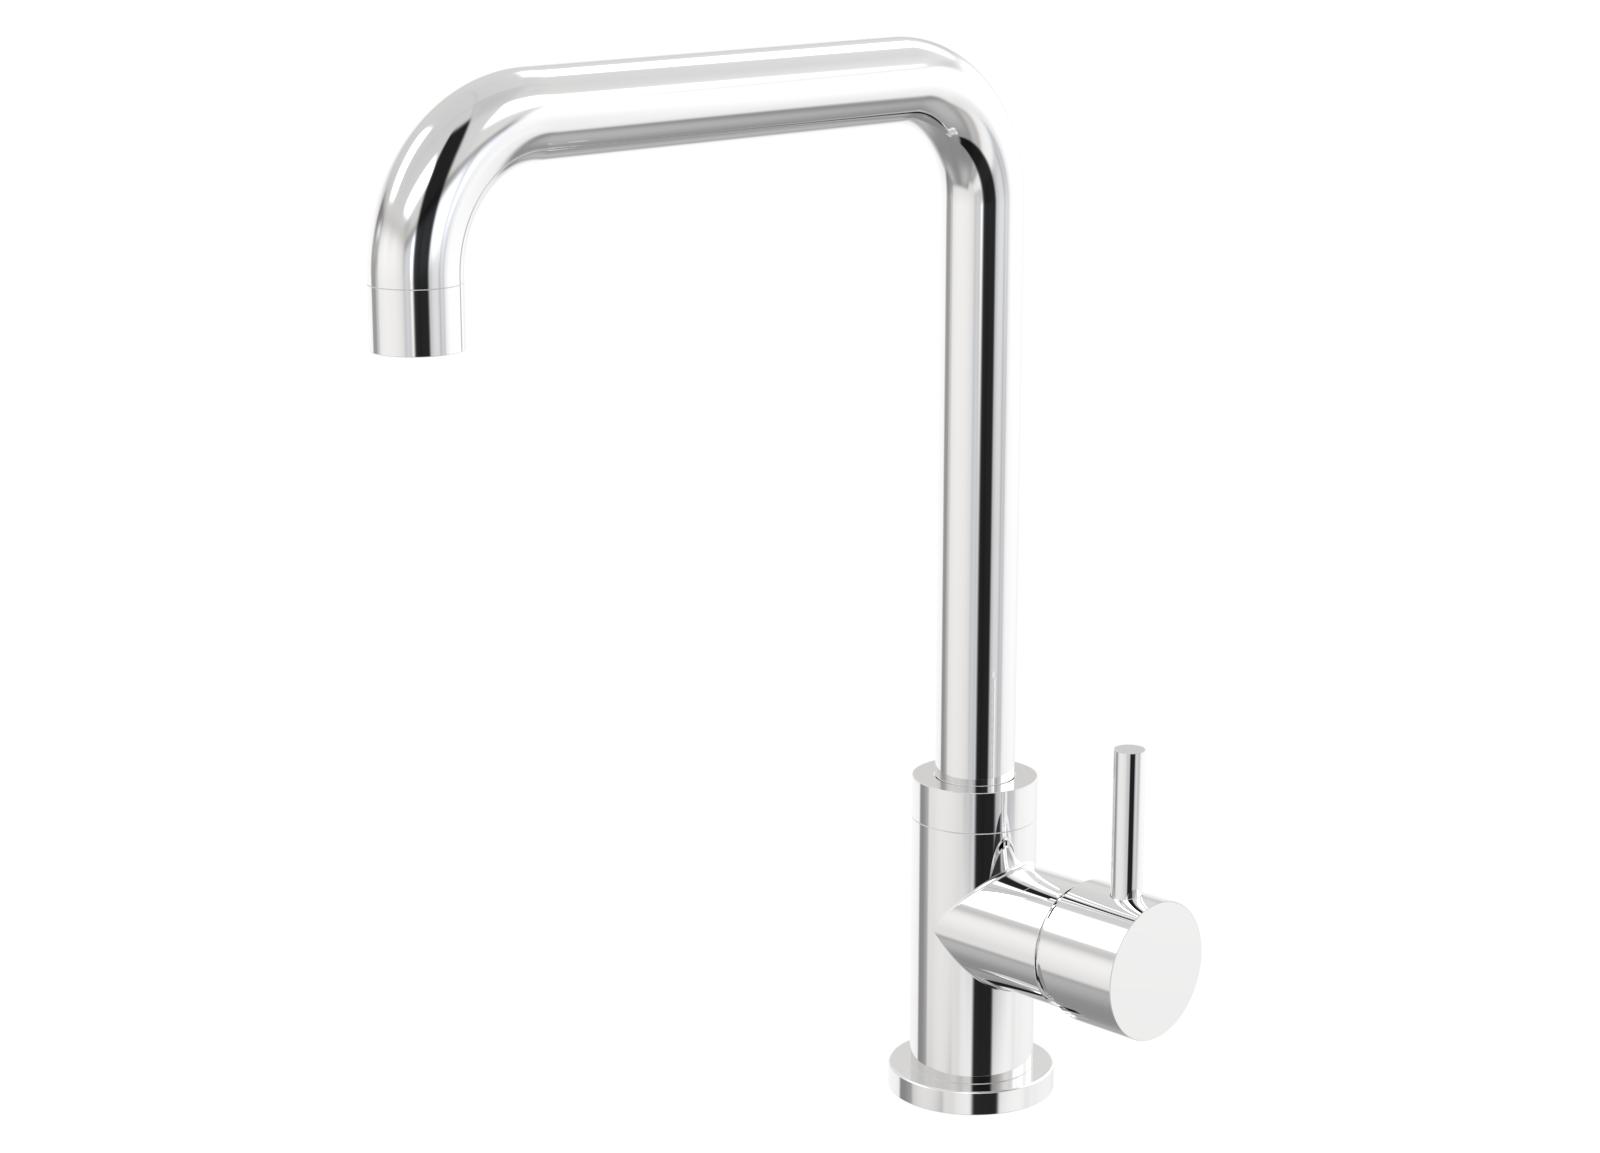 Par Taps Lugano Sink 90 Degree Mixer - Swivel